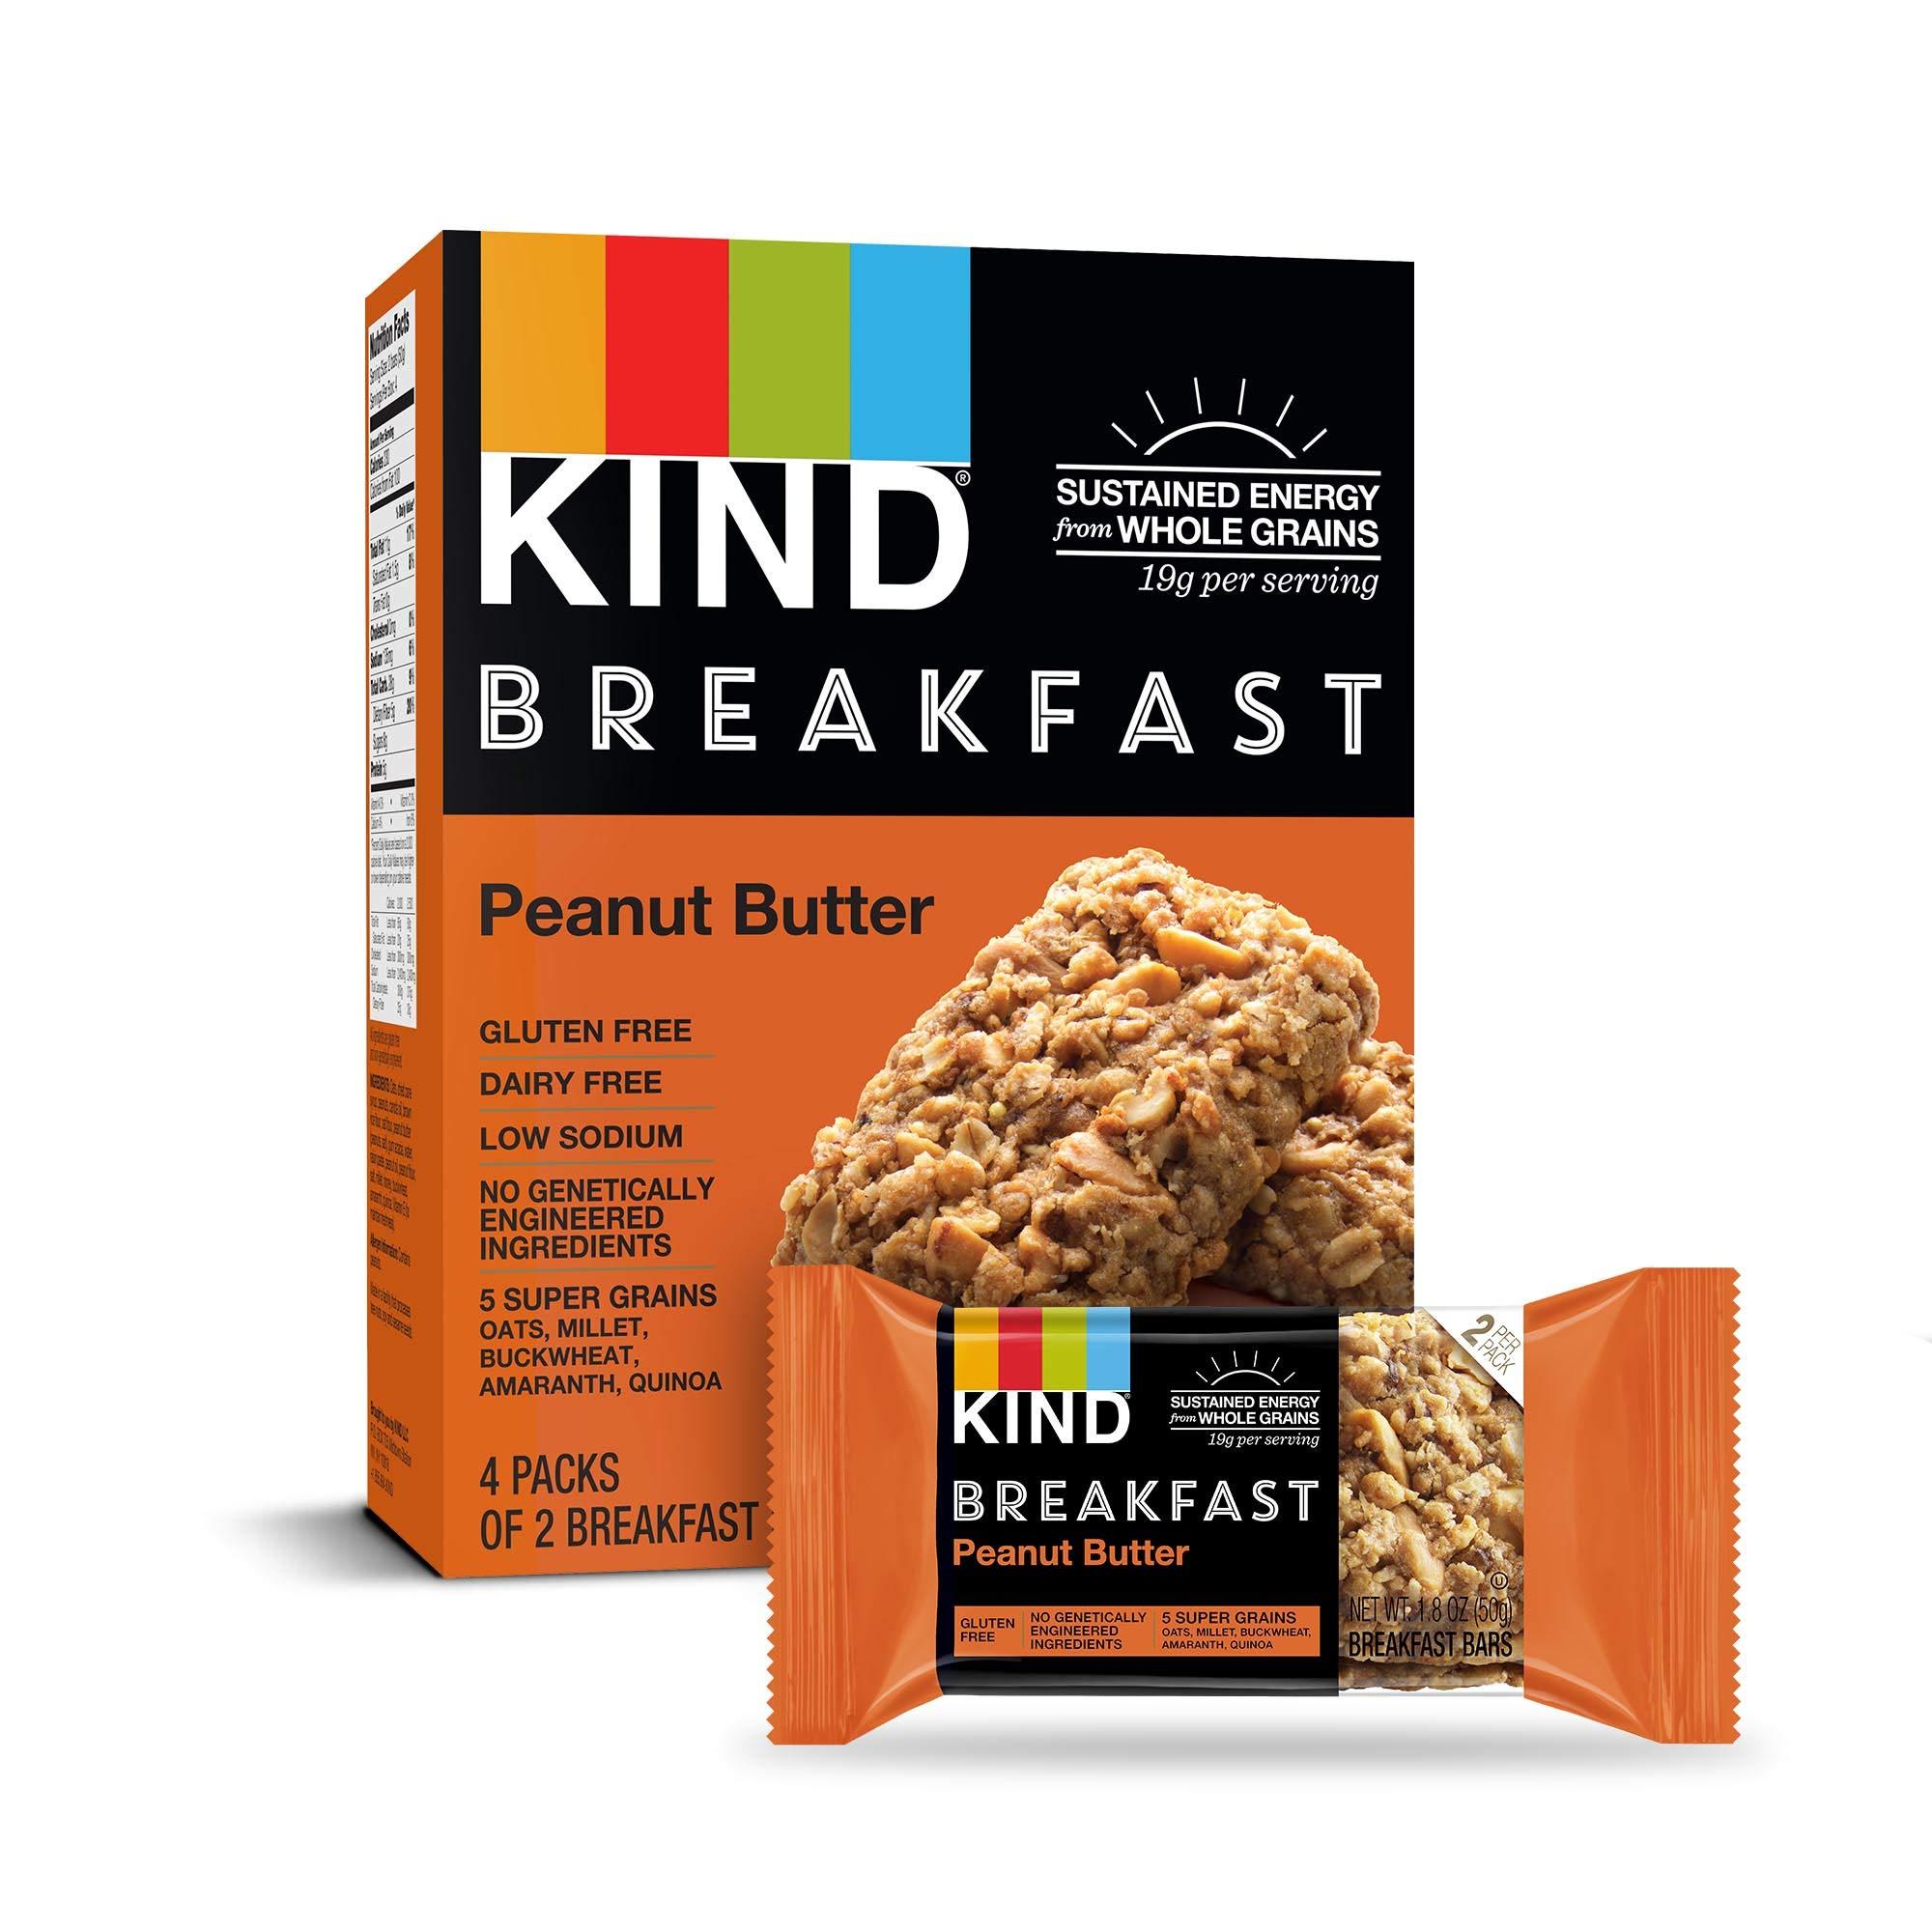 KIND Breakfast Bars, Peanut Butter, Gluten Free, 1.8 Ounce, 32 Count by KIND